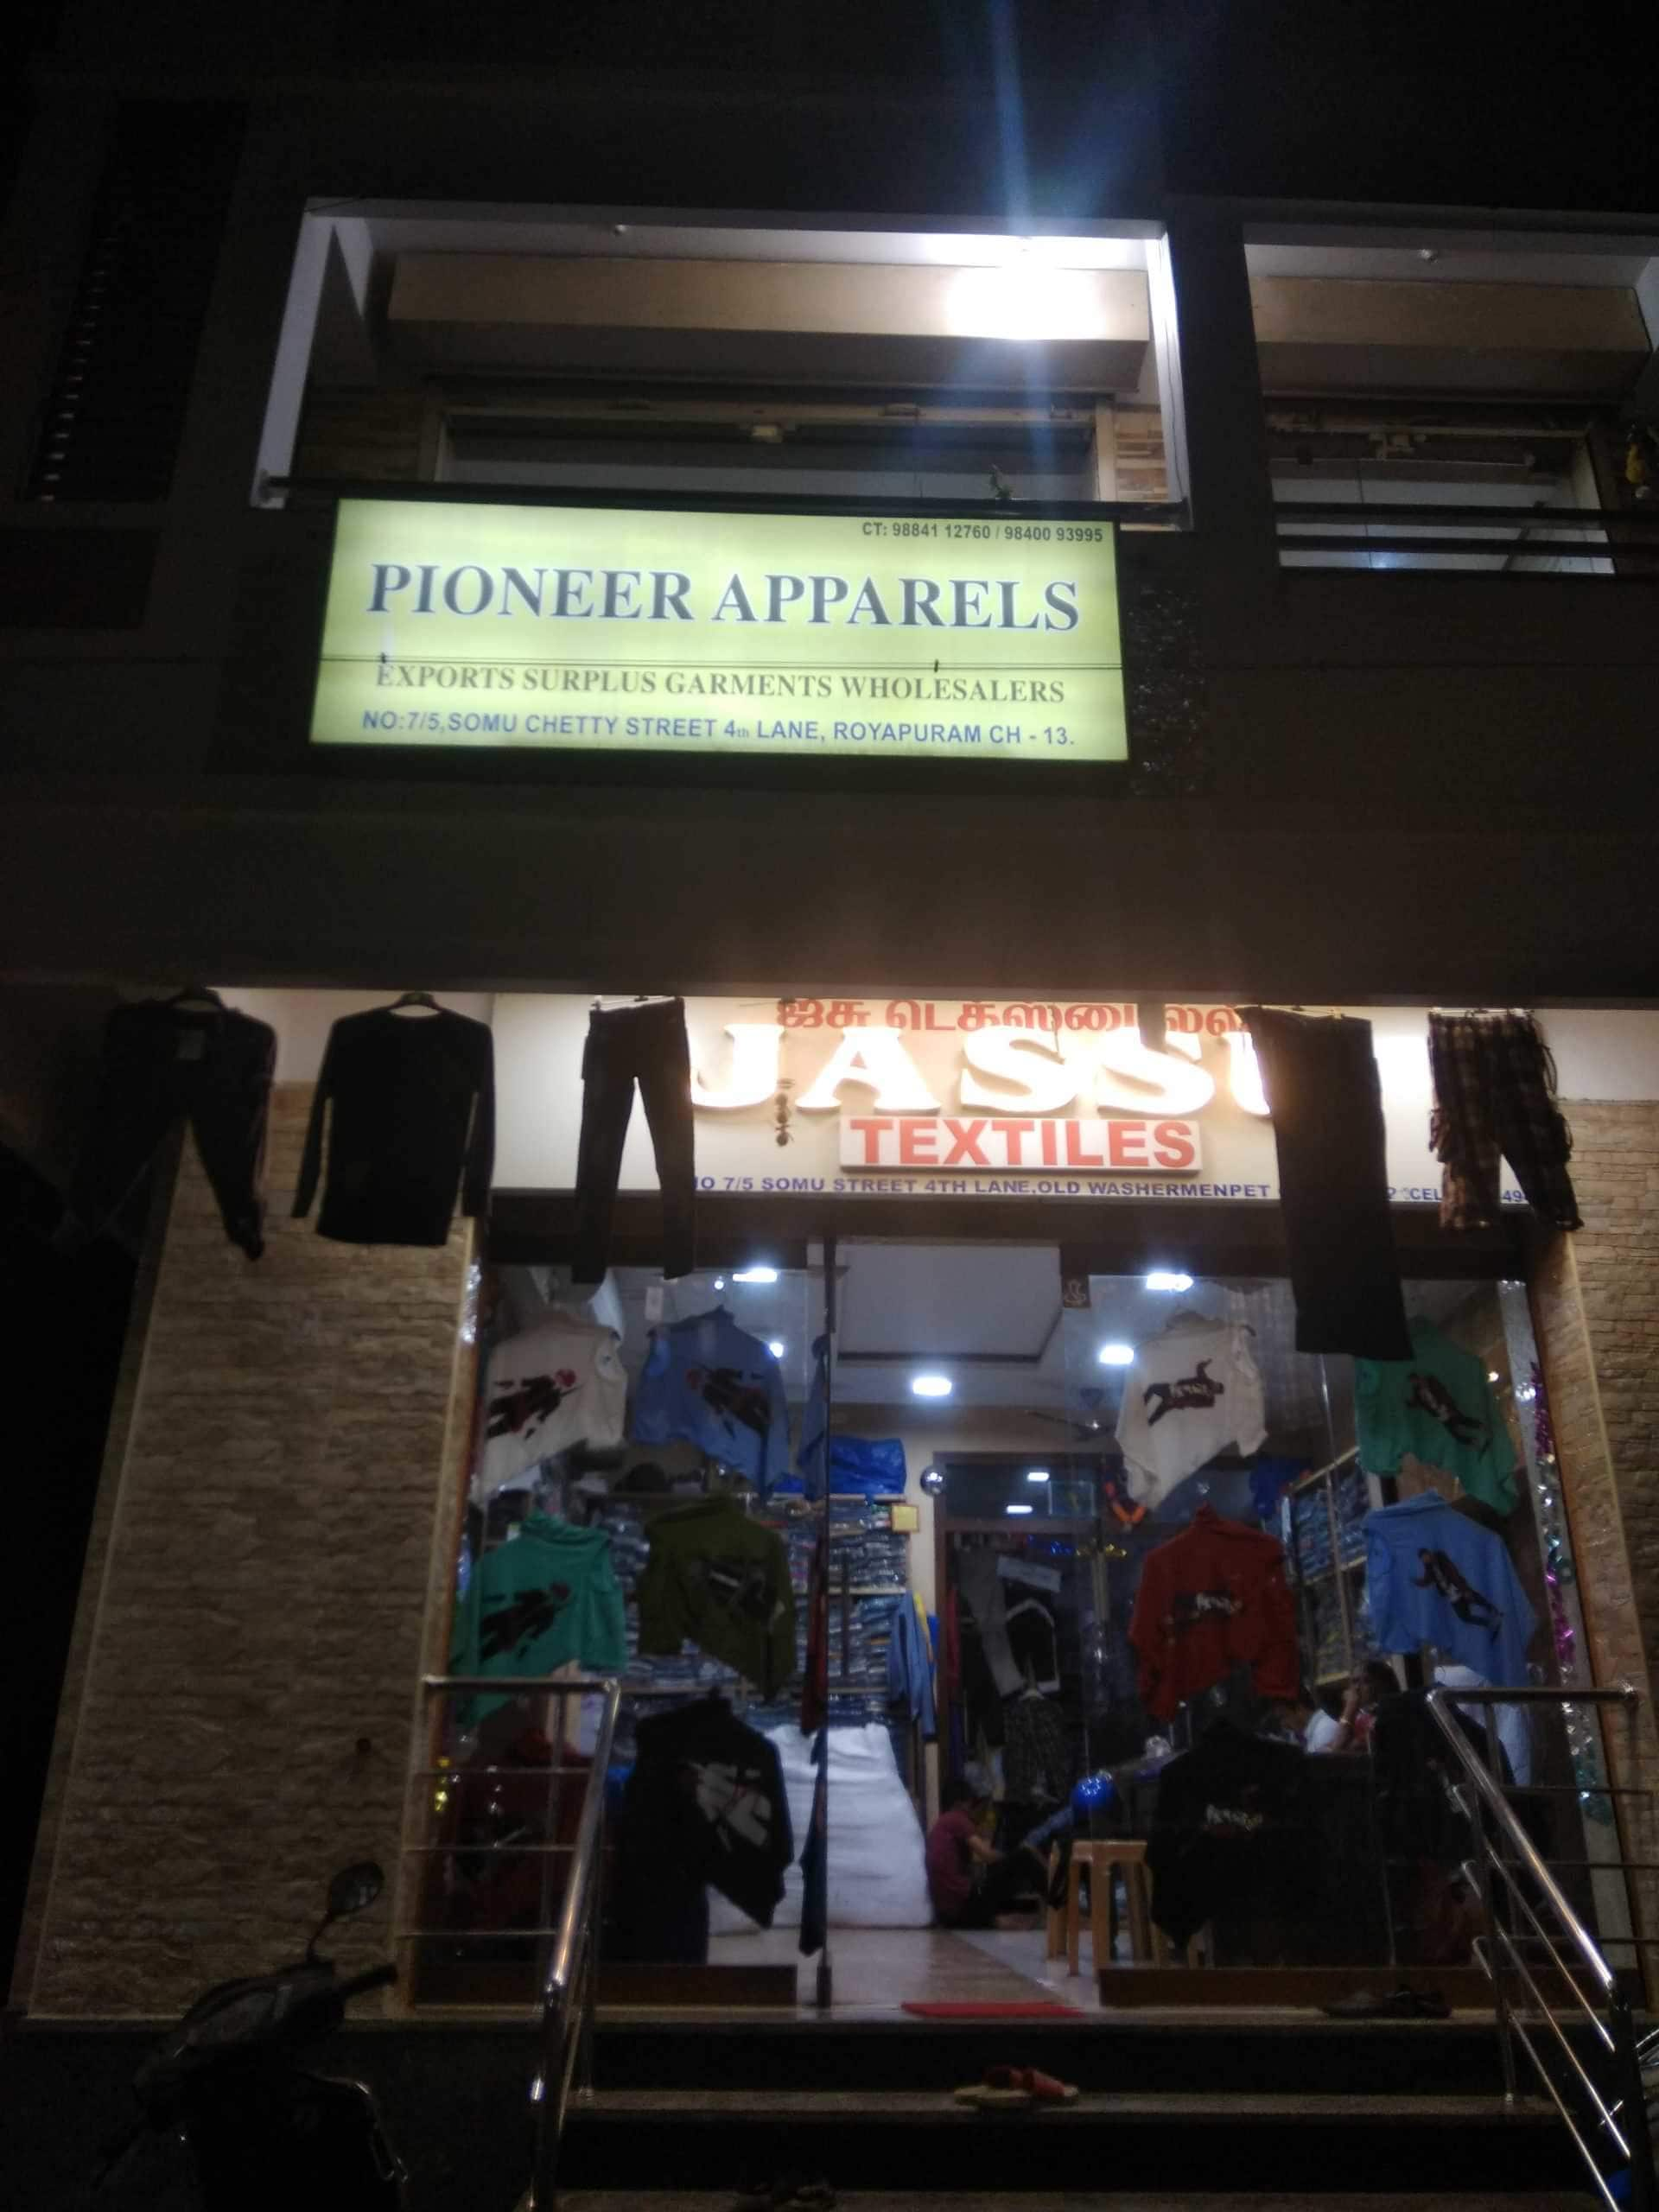 Top 50 Branded Export Surplus Garment Wholesalers in Chennai - Justdial